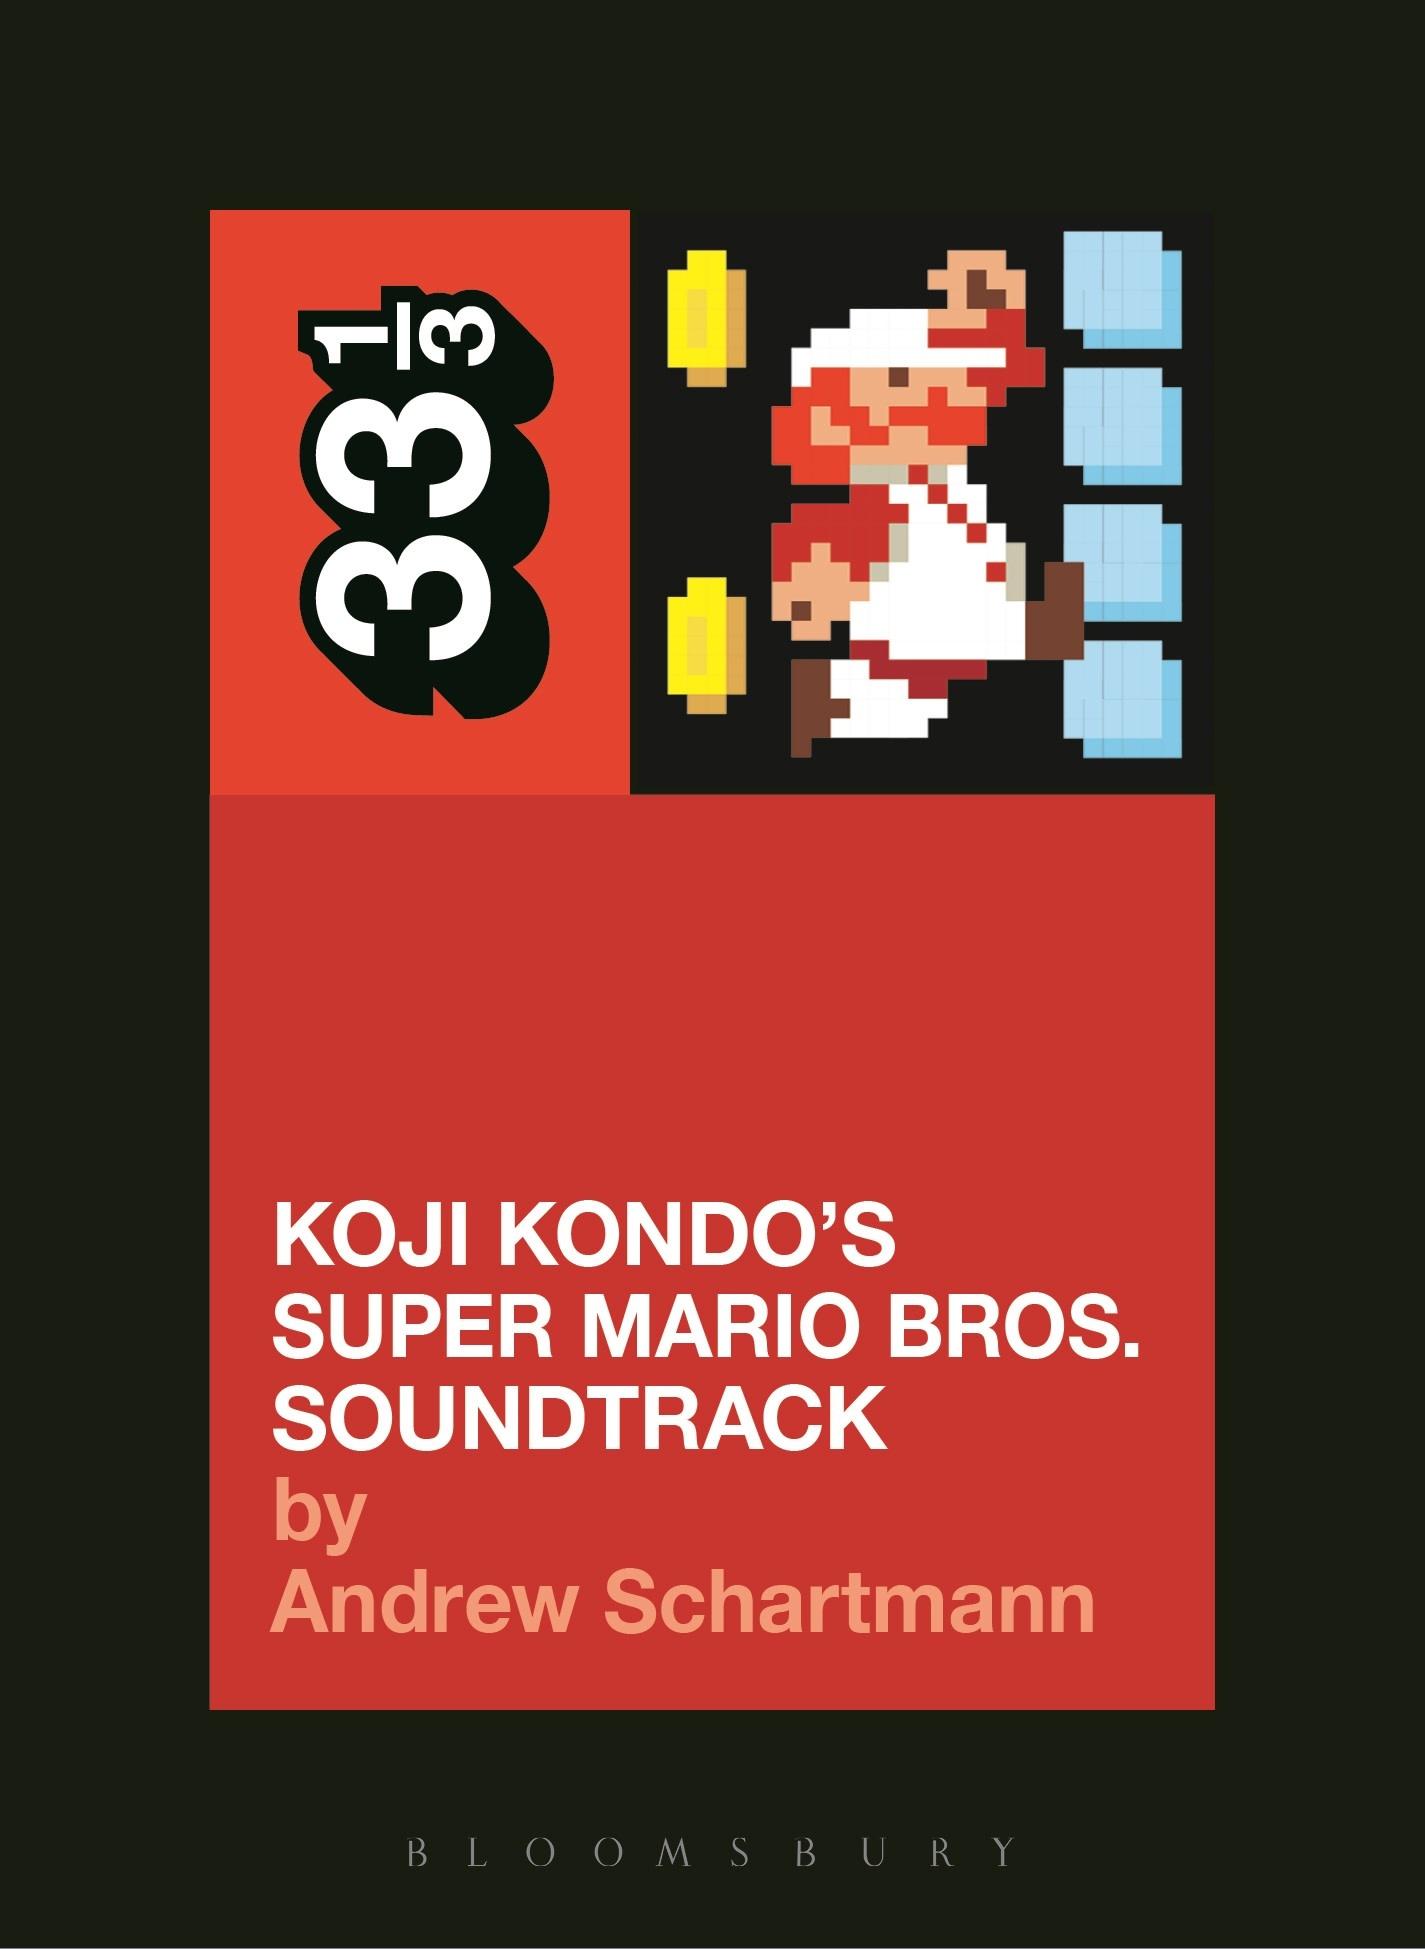 33 1/3 Series 33 1/3 - #106 - Koji Kondo's Super Mario Bros. Soundtrack - Andrew Schartmann